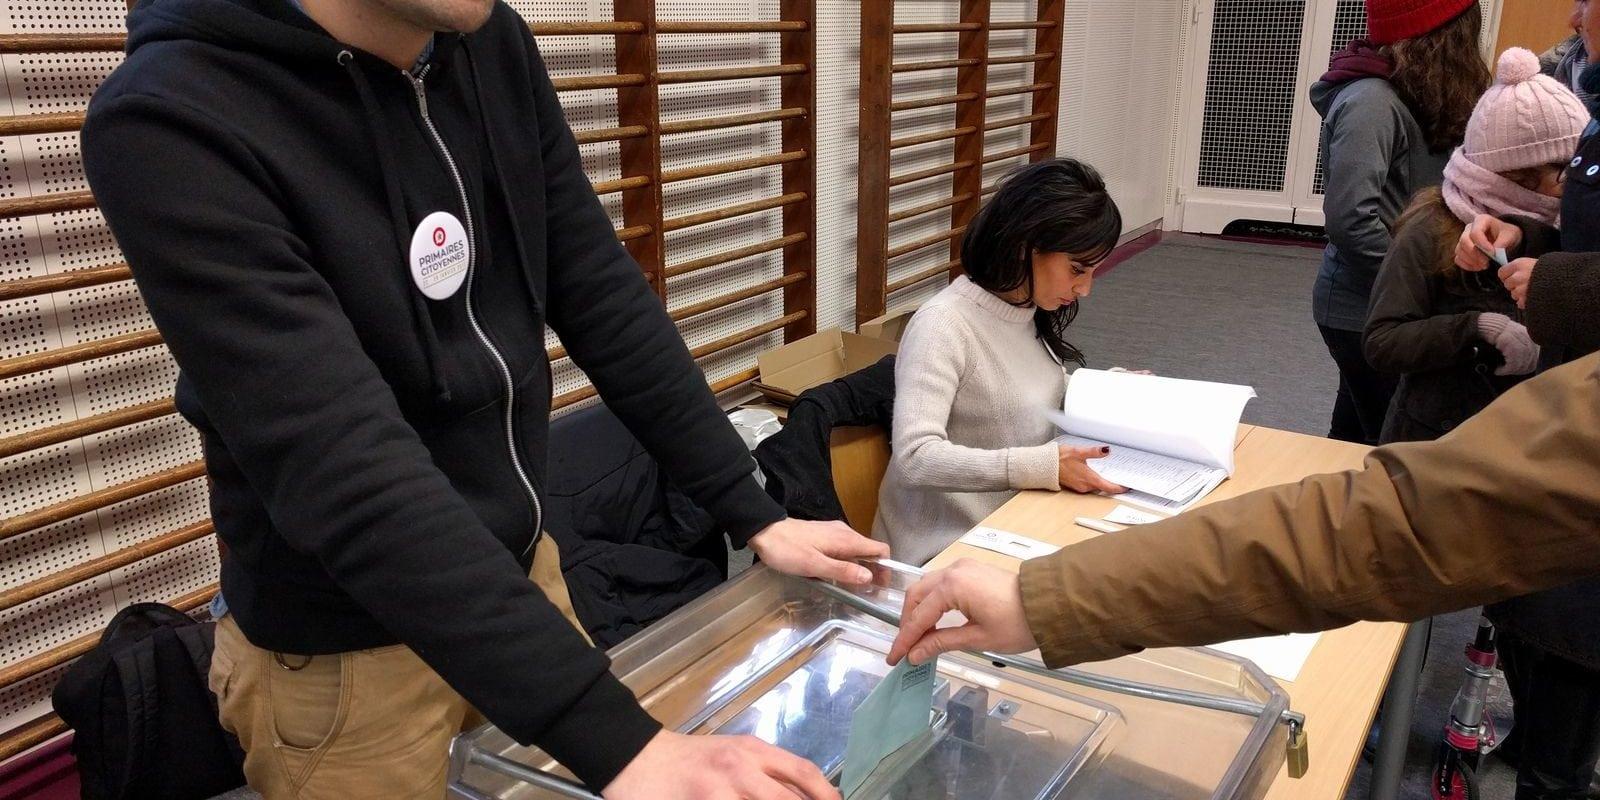 Primaires de la gauche : Benoît Hamon en tête en France et en Alsace